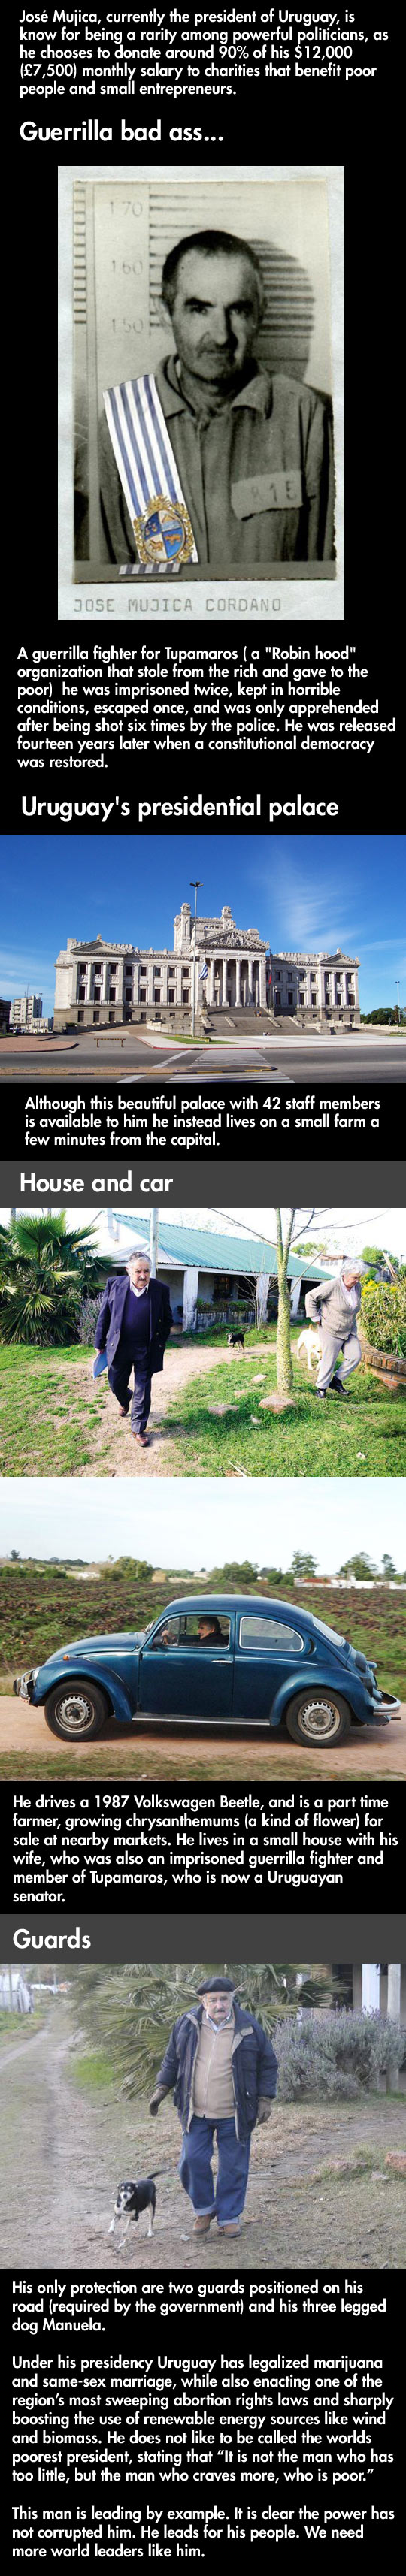 cool-Uruguay-president-Jose-Mujica-poor